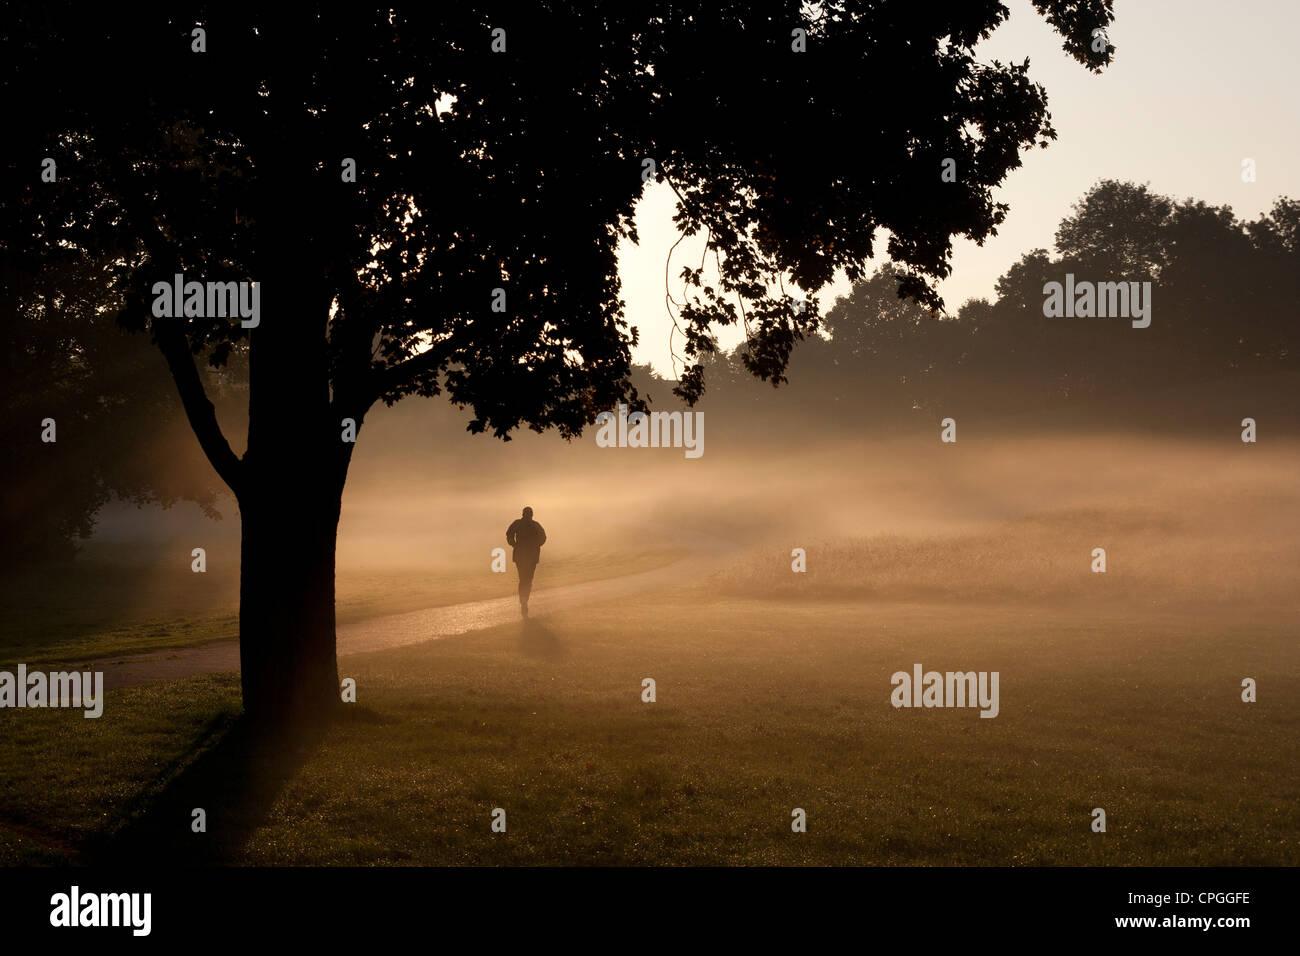 morgendliches Joggen im Park - Stock Image